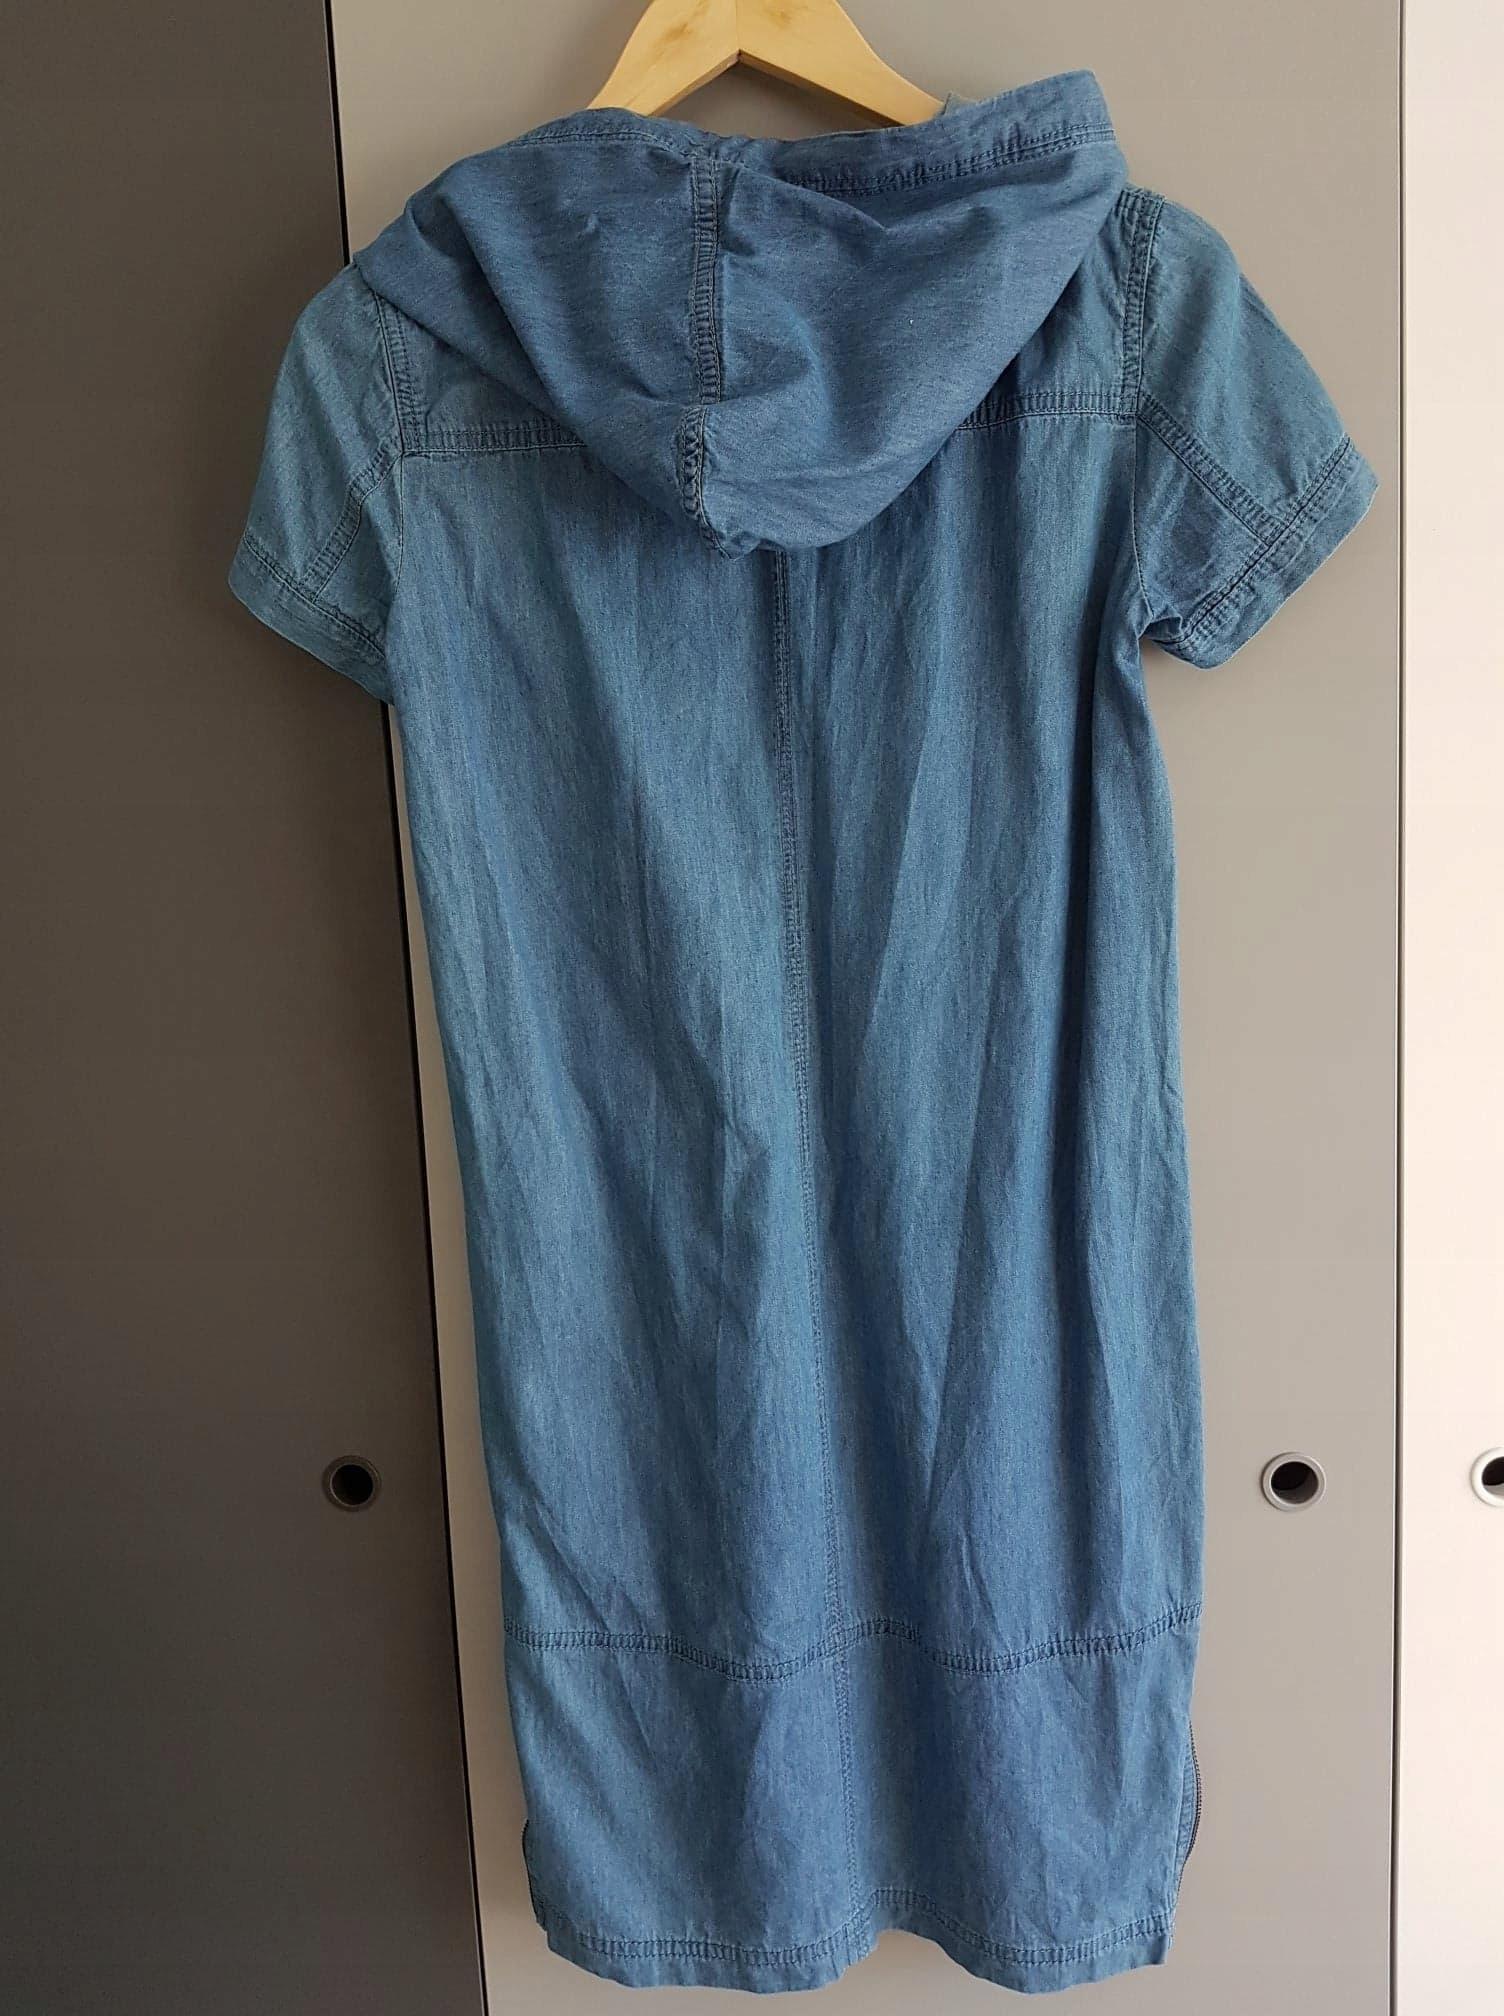 d6e974cc TATUUM - sportowa, jeansowa sukienka rozm 34 - 7458078491 ...